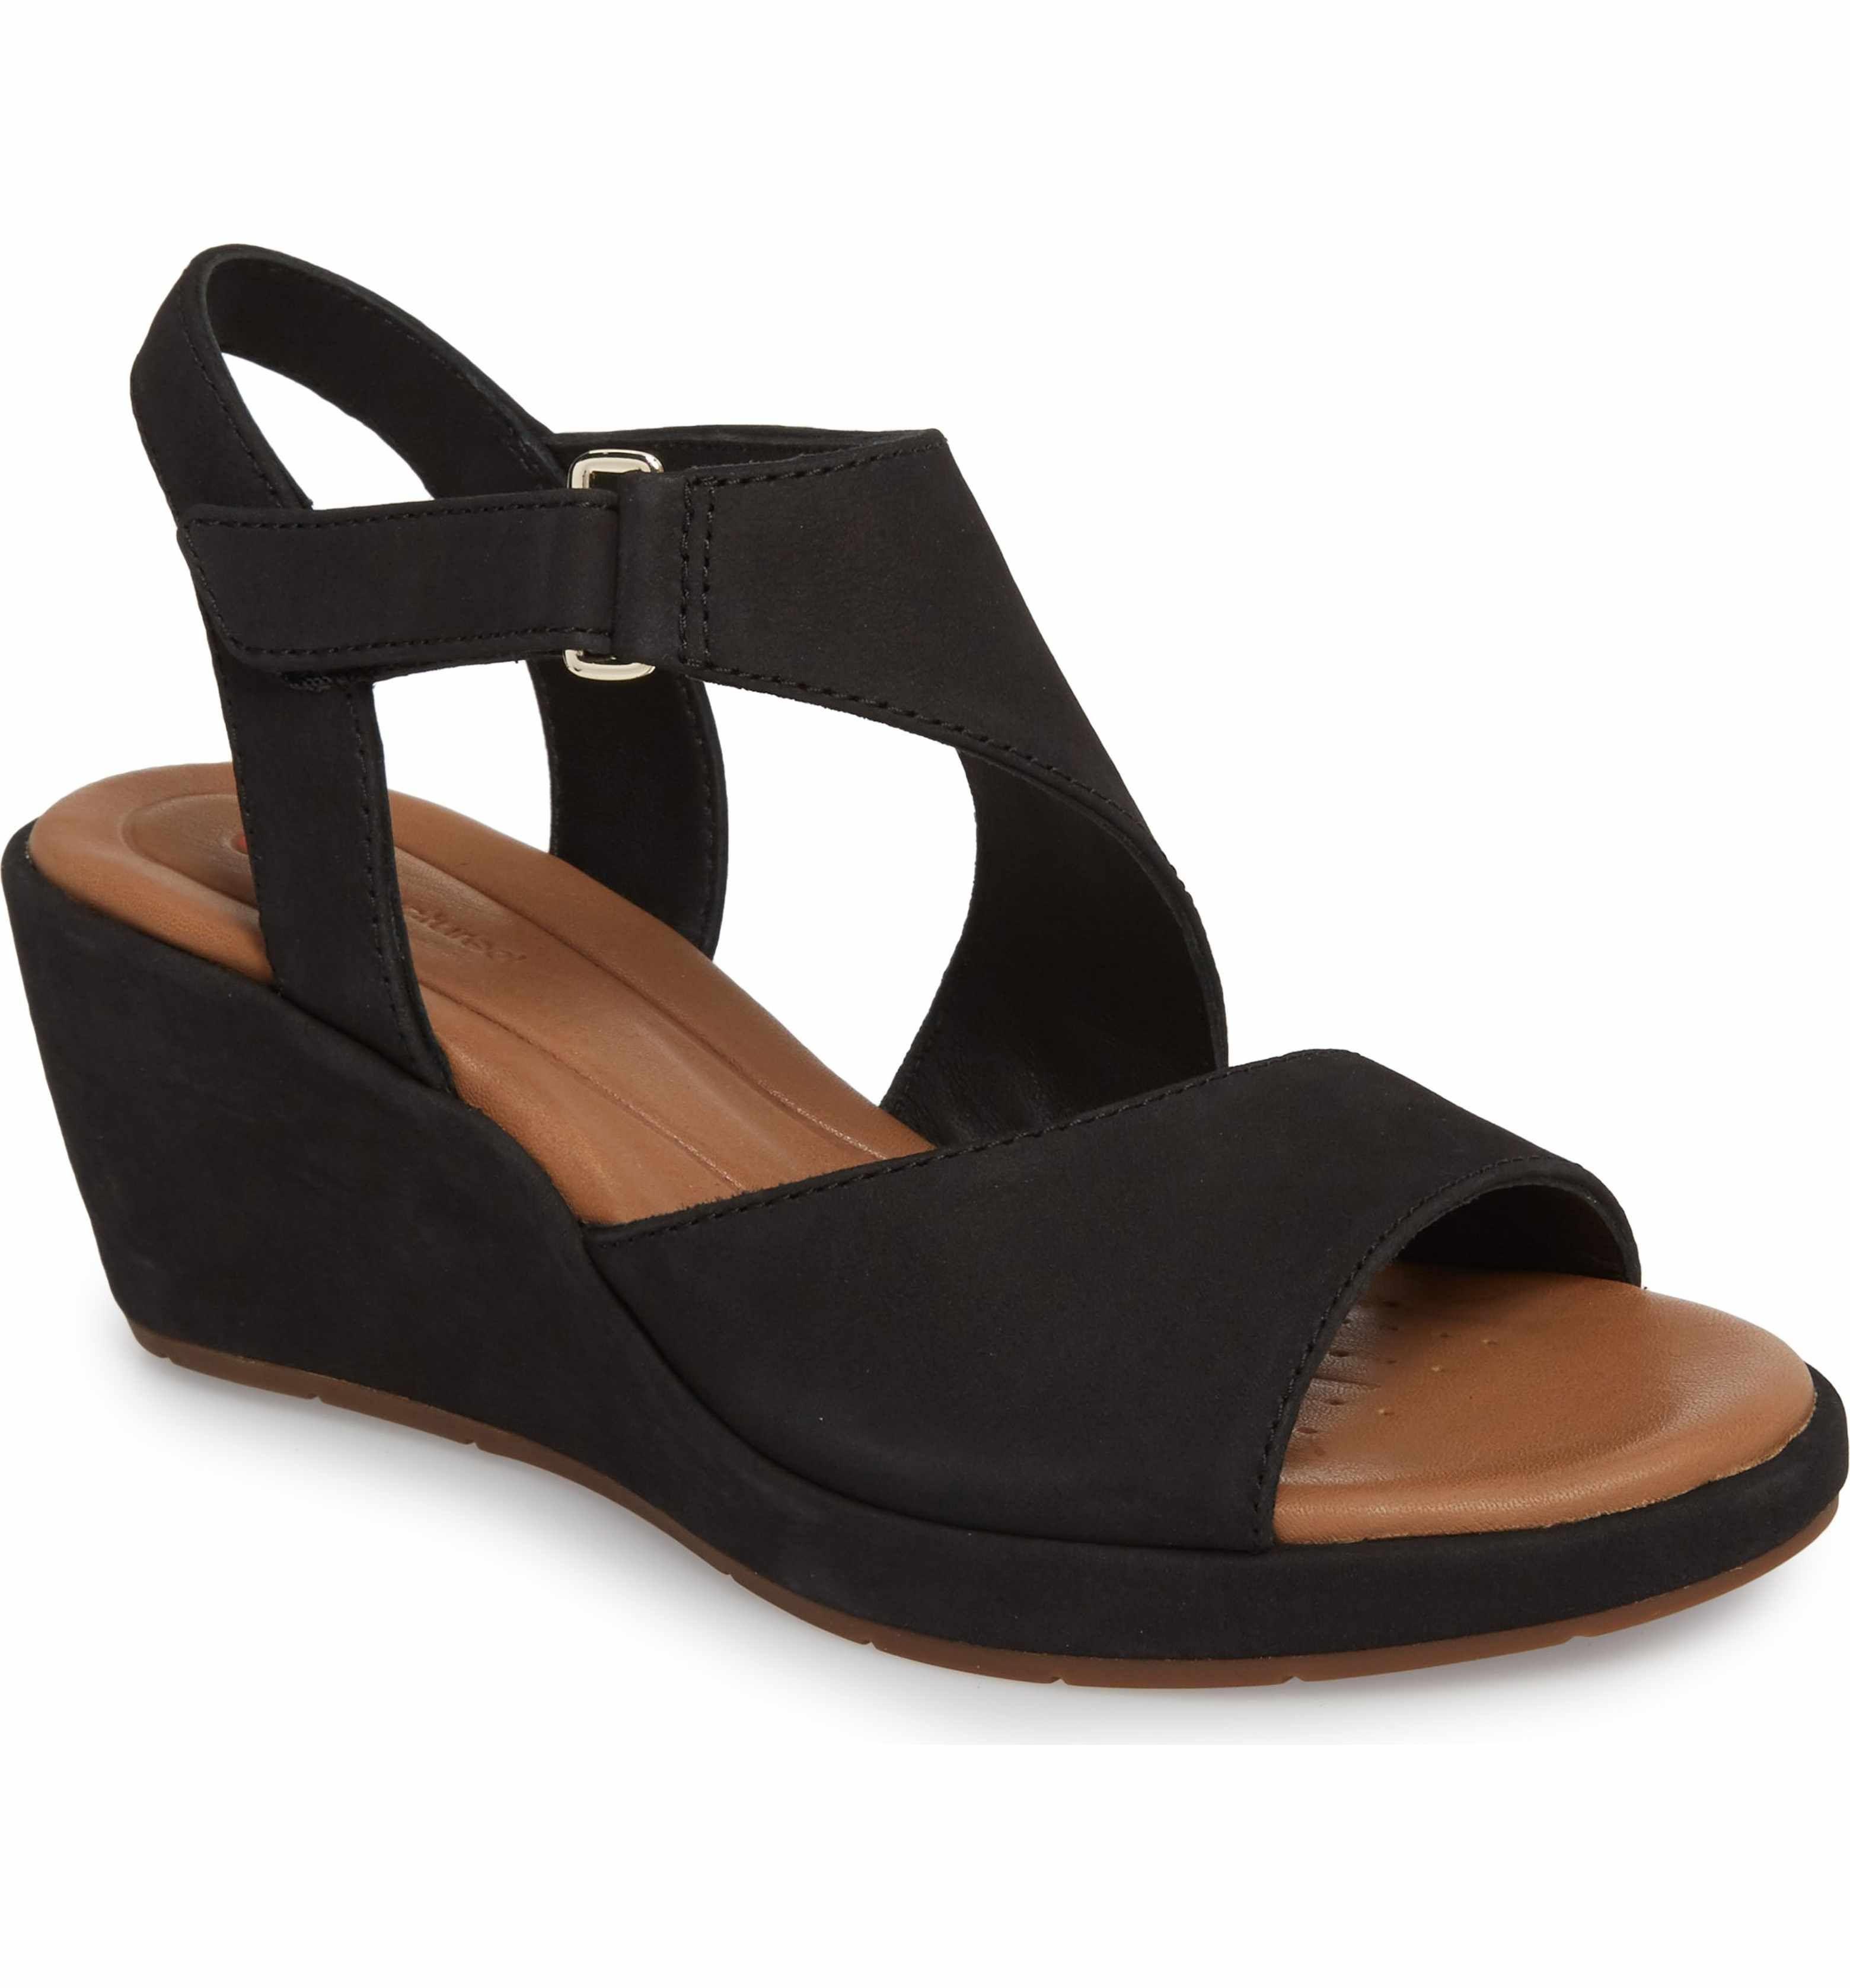 cb7745f9bf29 Main Image - Clarks® Un Plaza Wedge Sandal (Women)